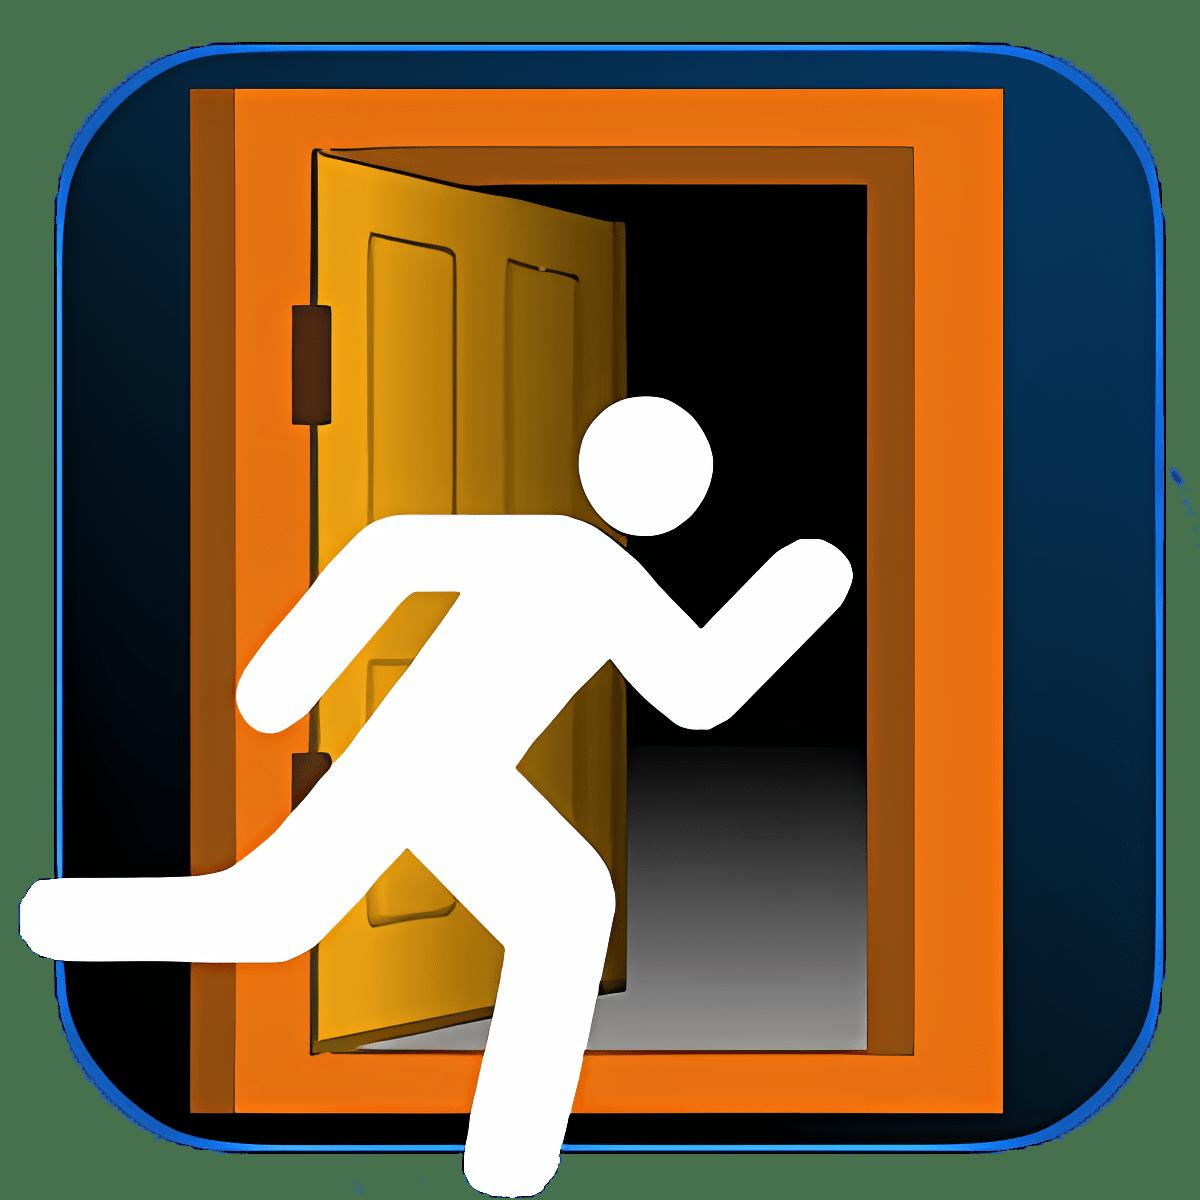 Para abrir la puerta